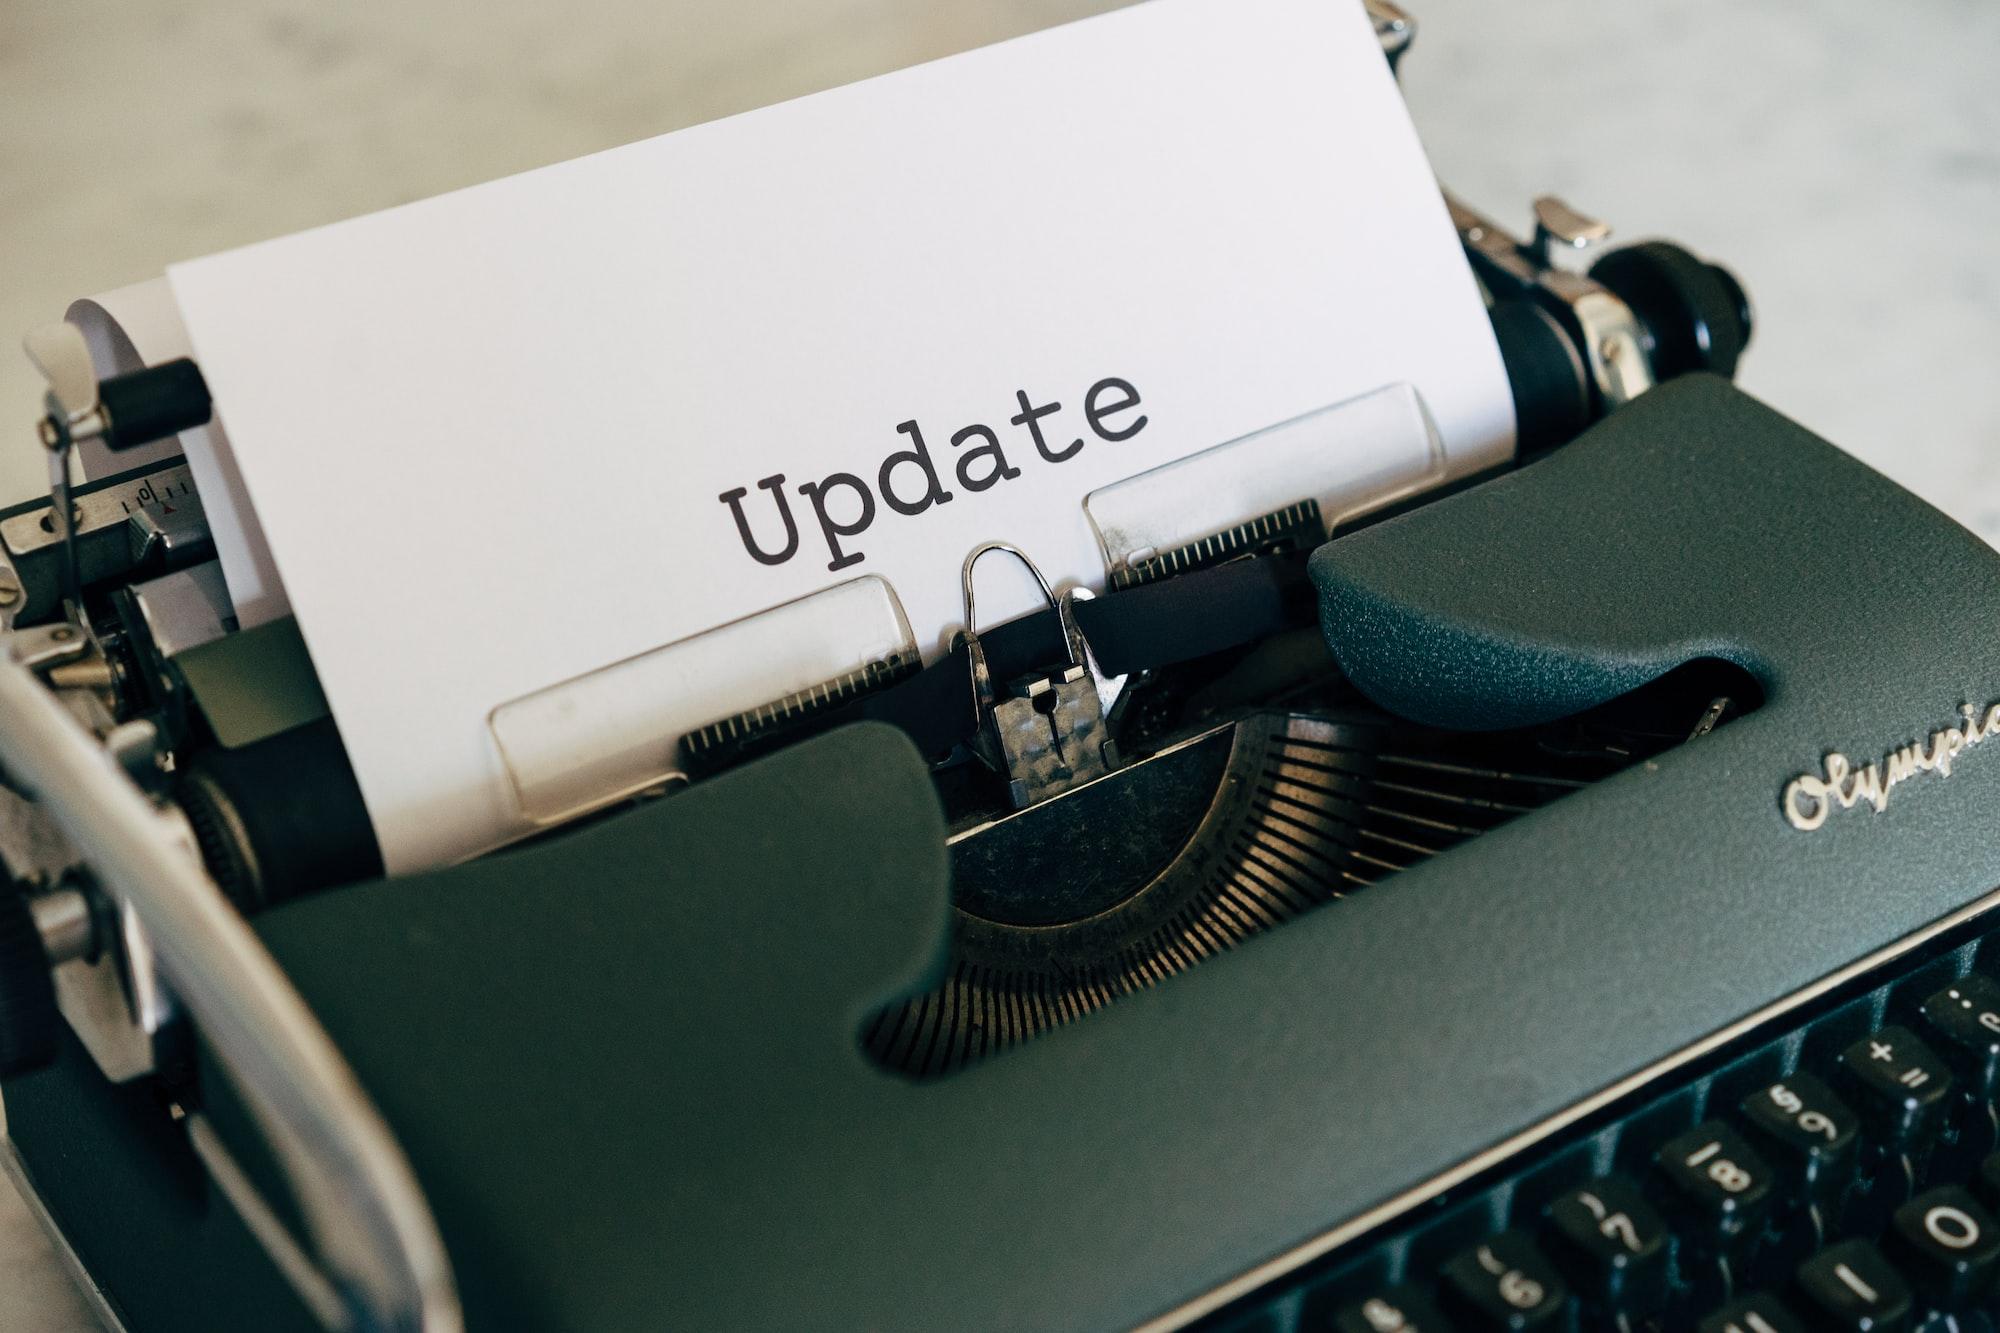 Blog Update!